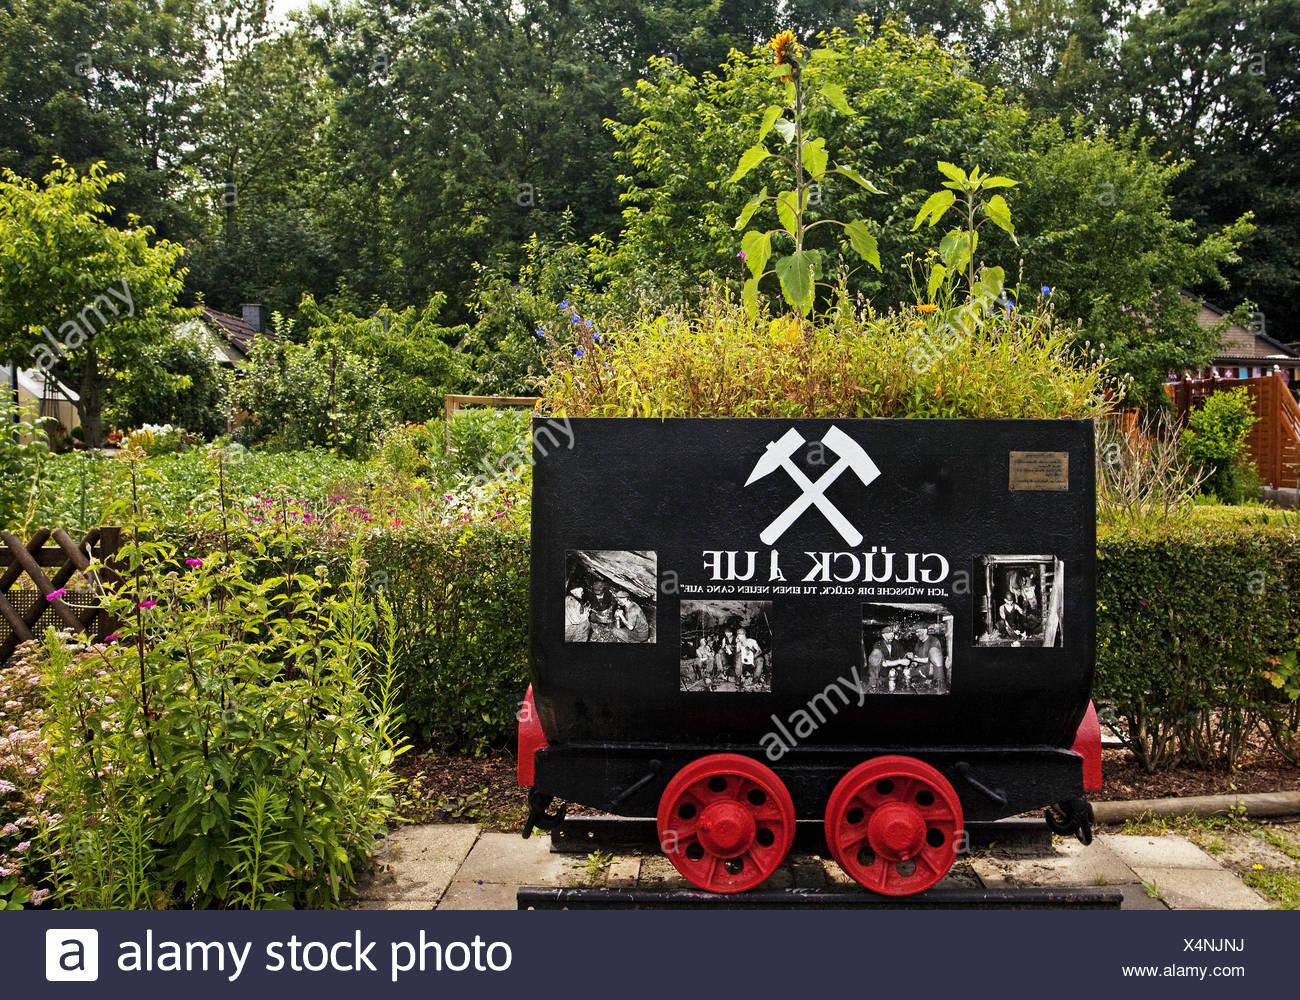 Kohlen Lore in den Kleingärten Bochum, Deutschland. Stockbild